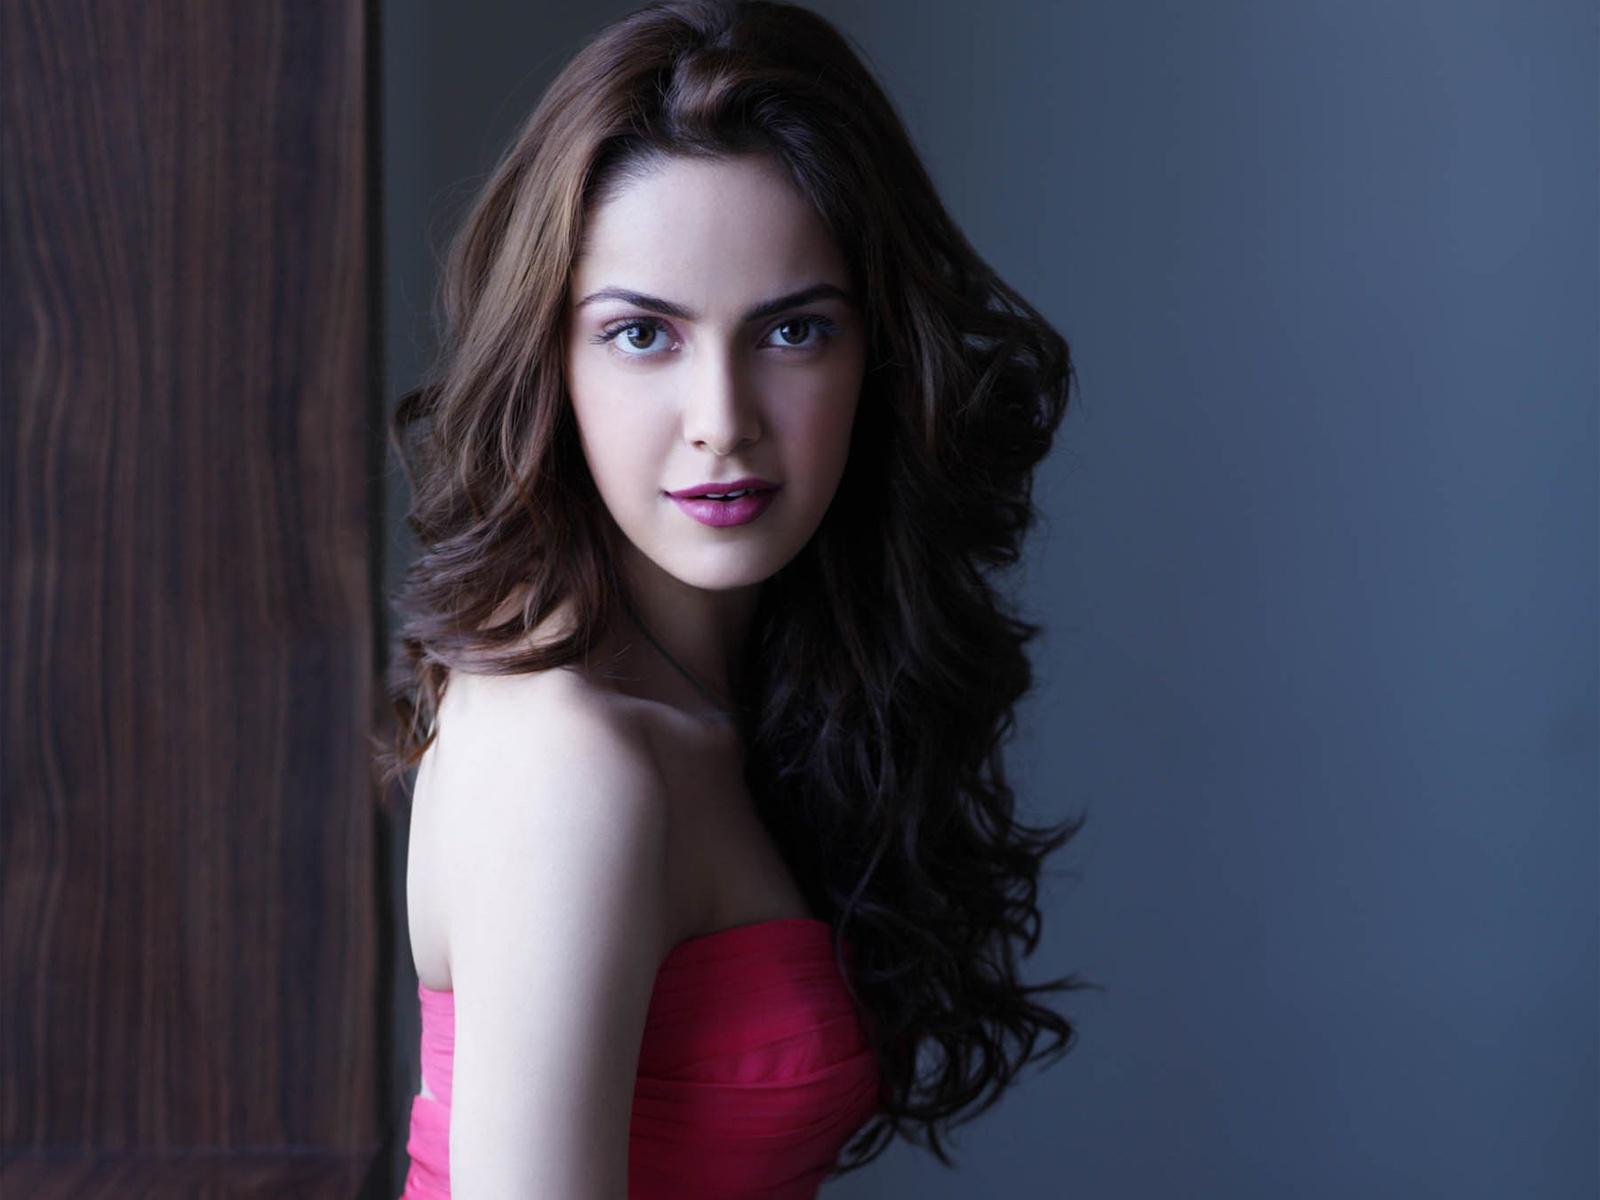 Full Hd Wallpapers Bollywood Actress Wallpaper 1600x1200